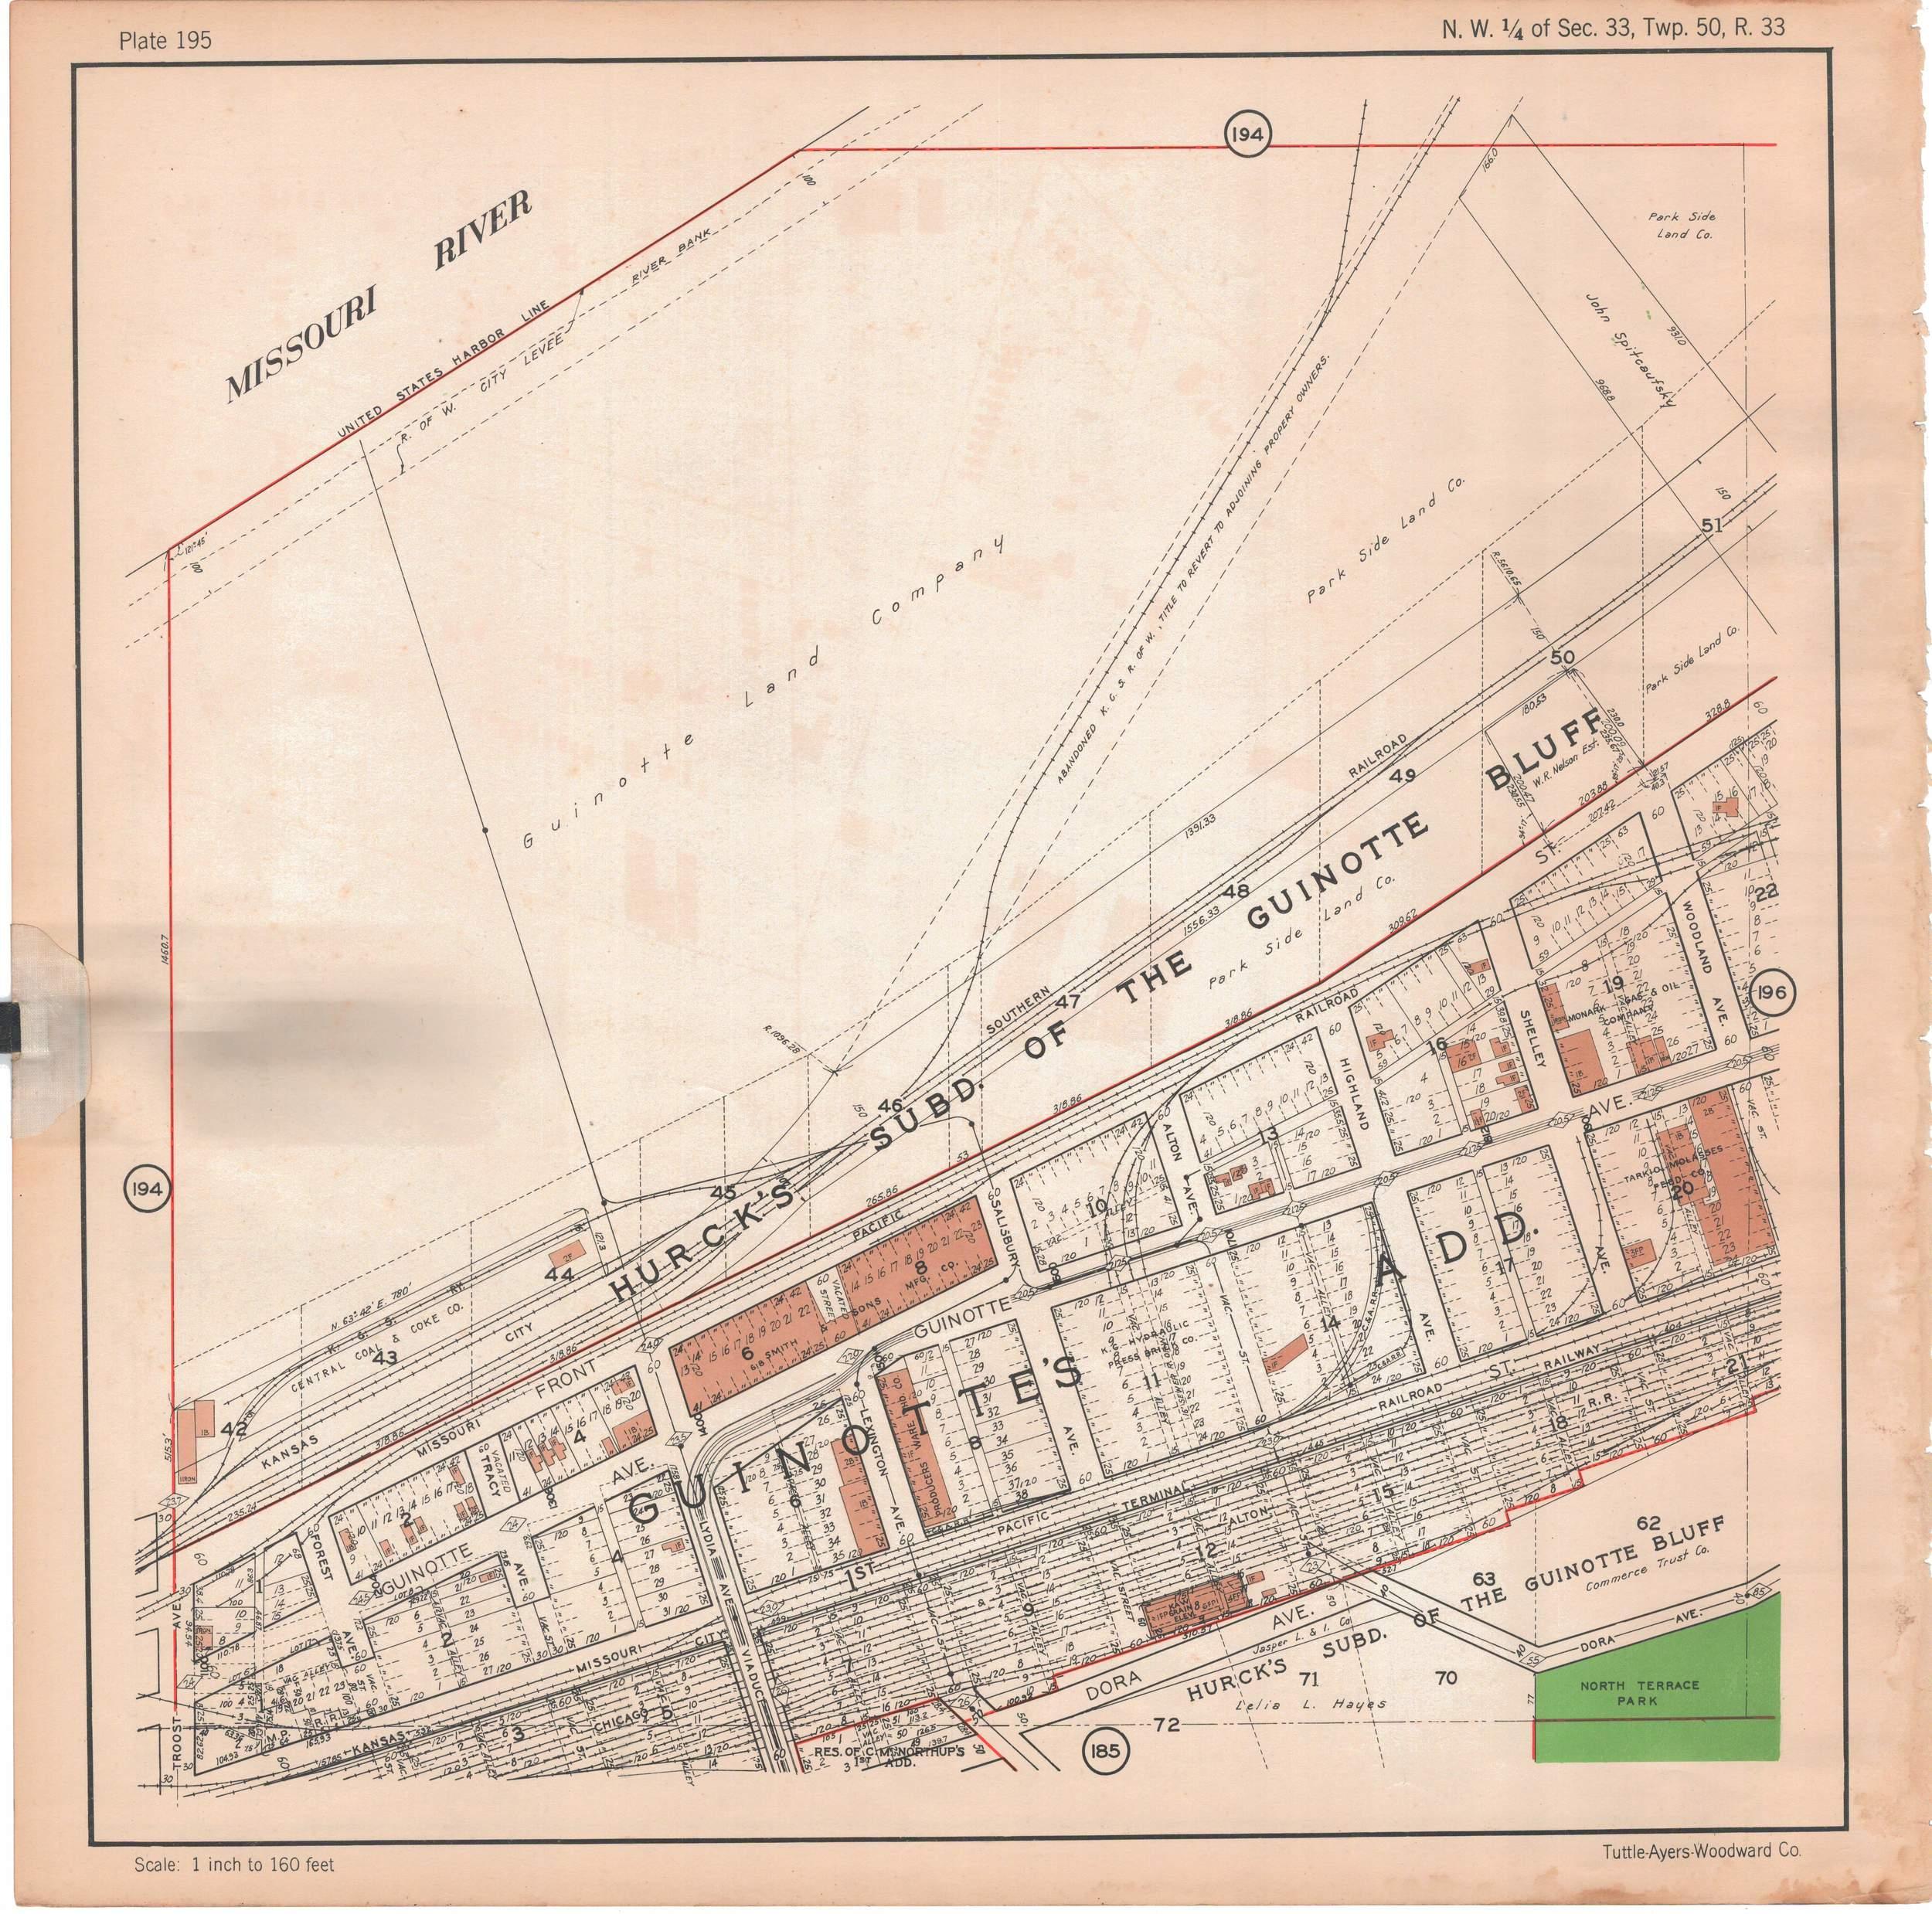 1925 TUTTLE_AYERS_Plate_195.JPG